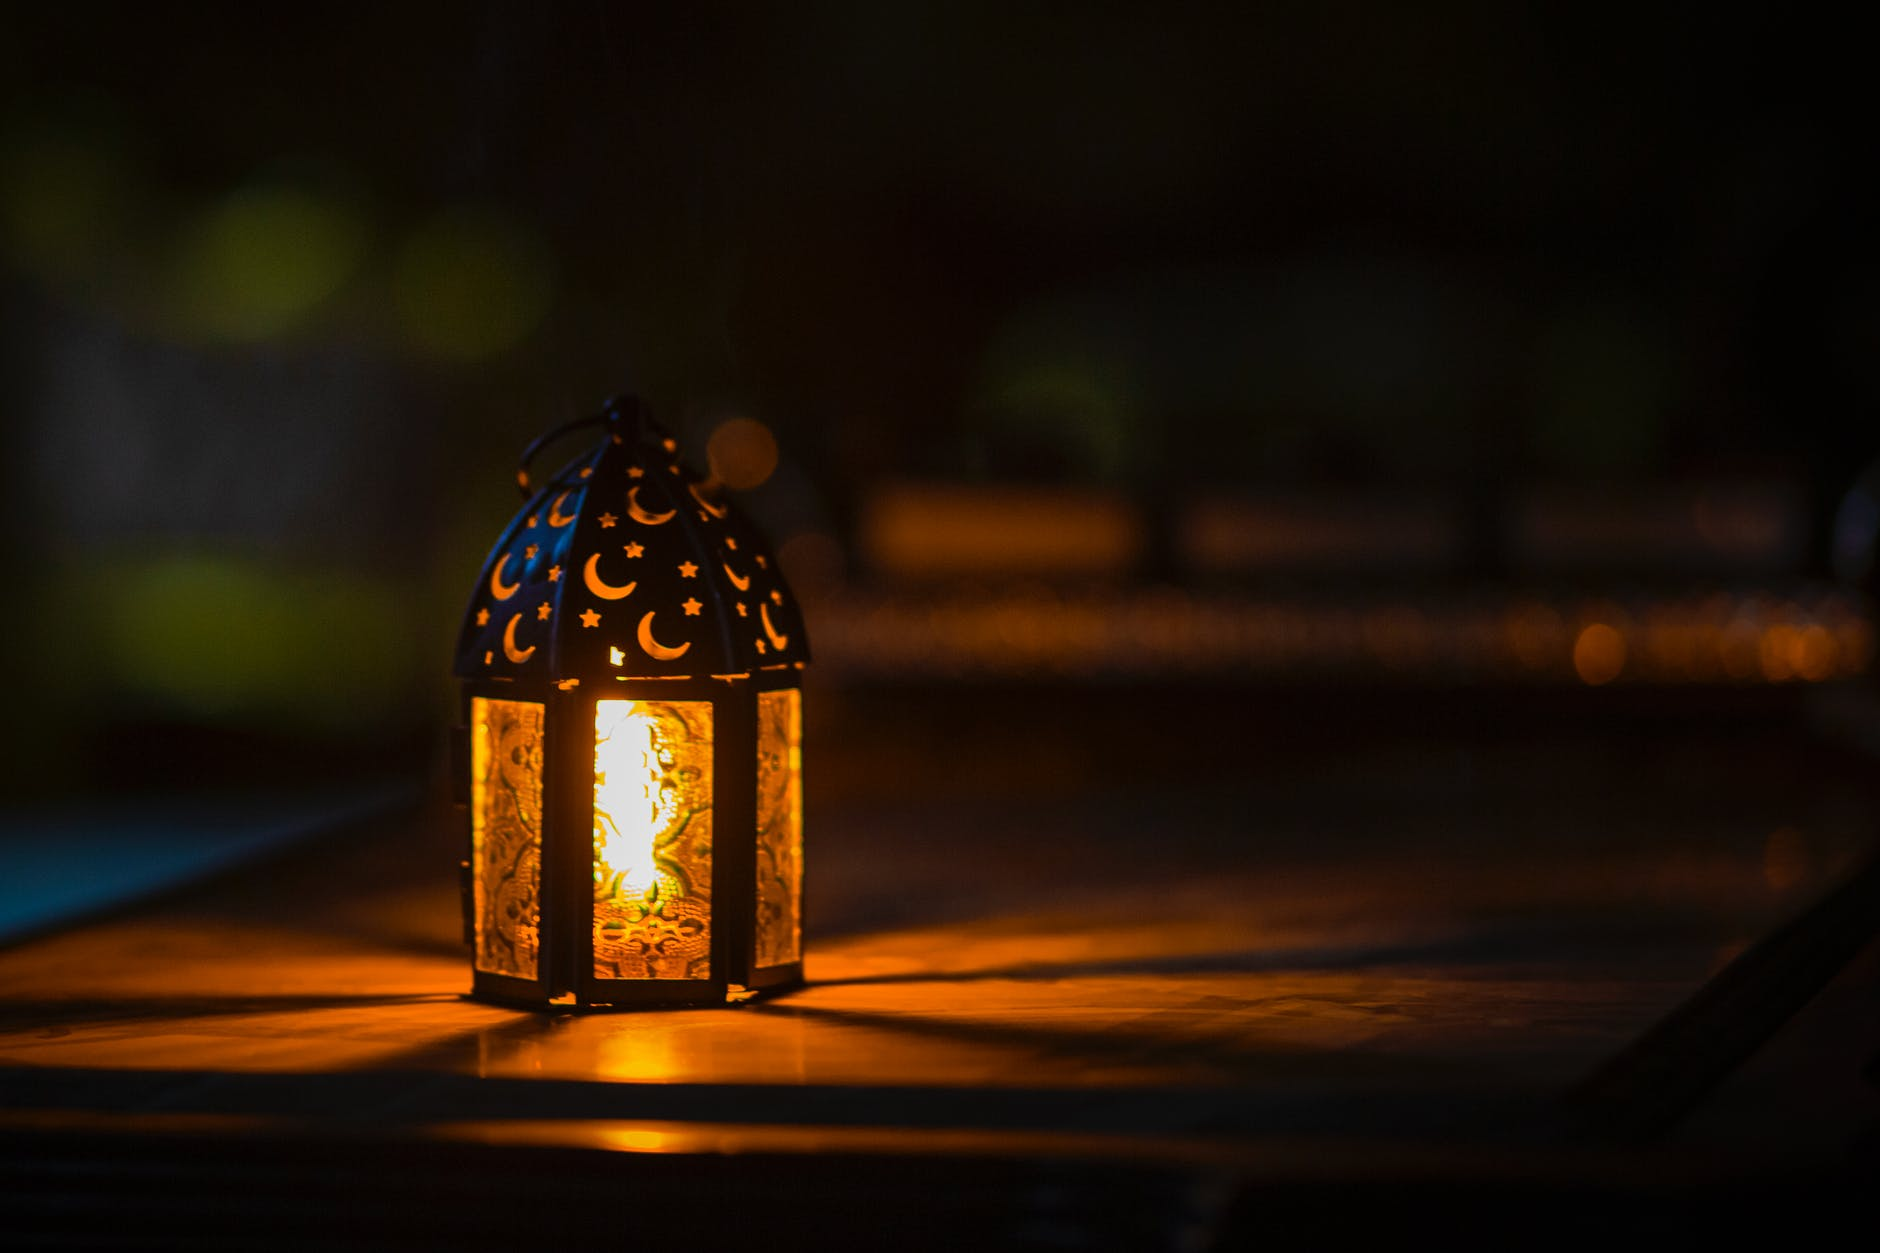 استقبال رمضان المبارک